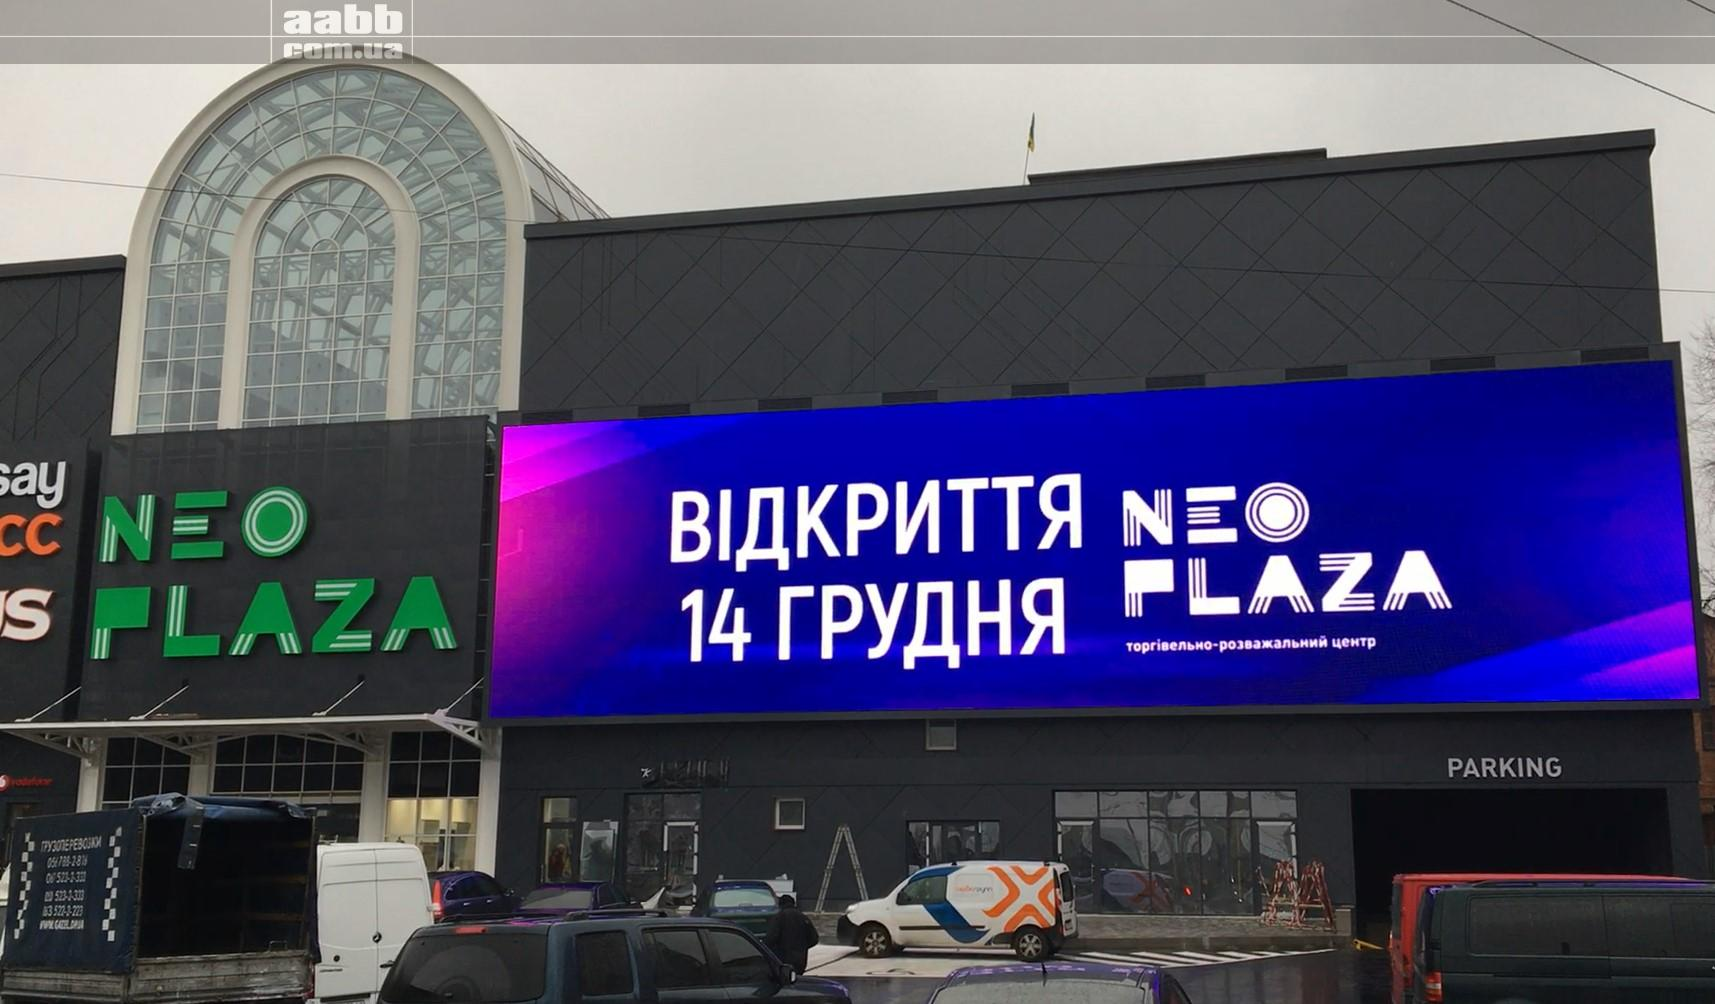 Реклама на медиафасаде ТРЦ Neo Plaza